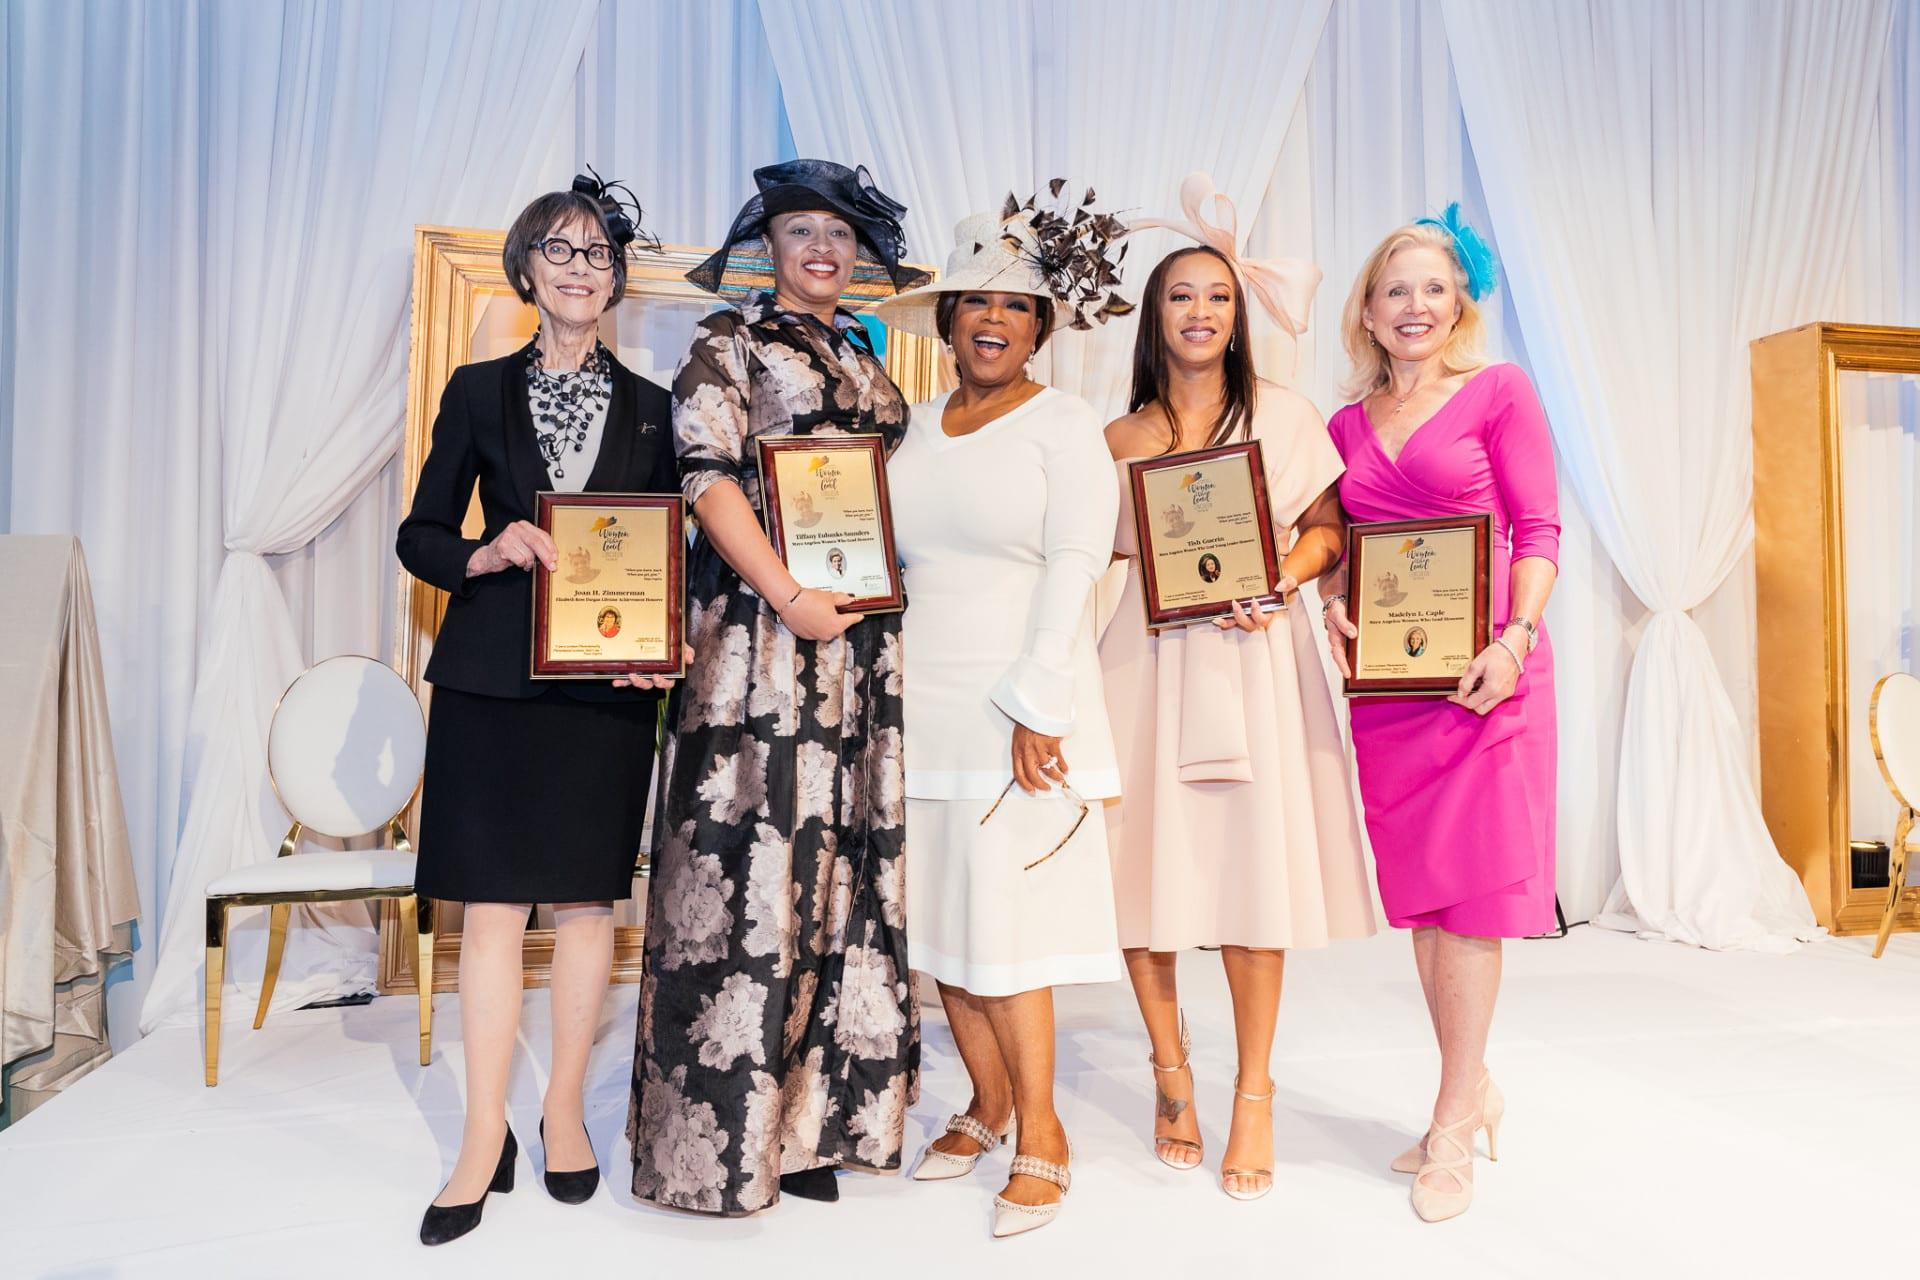 Maya Angelou Women Who Lead honorees - Joan Zimmerman, Tiffany Eubanks-Saunders, Oprah Winfrey, Tish Guerin and Madelyn Caple - Photo by Keyna B